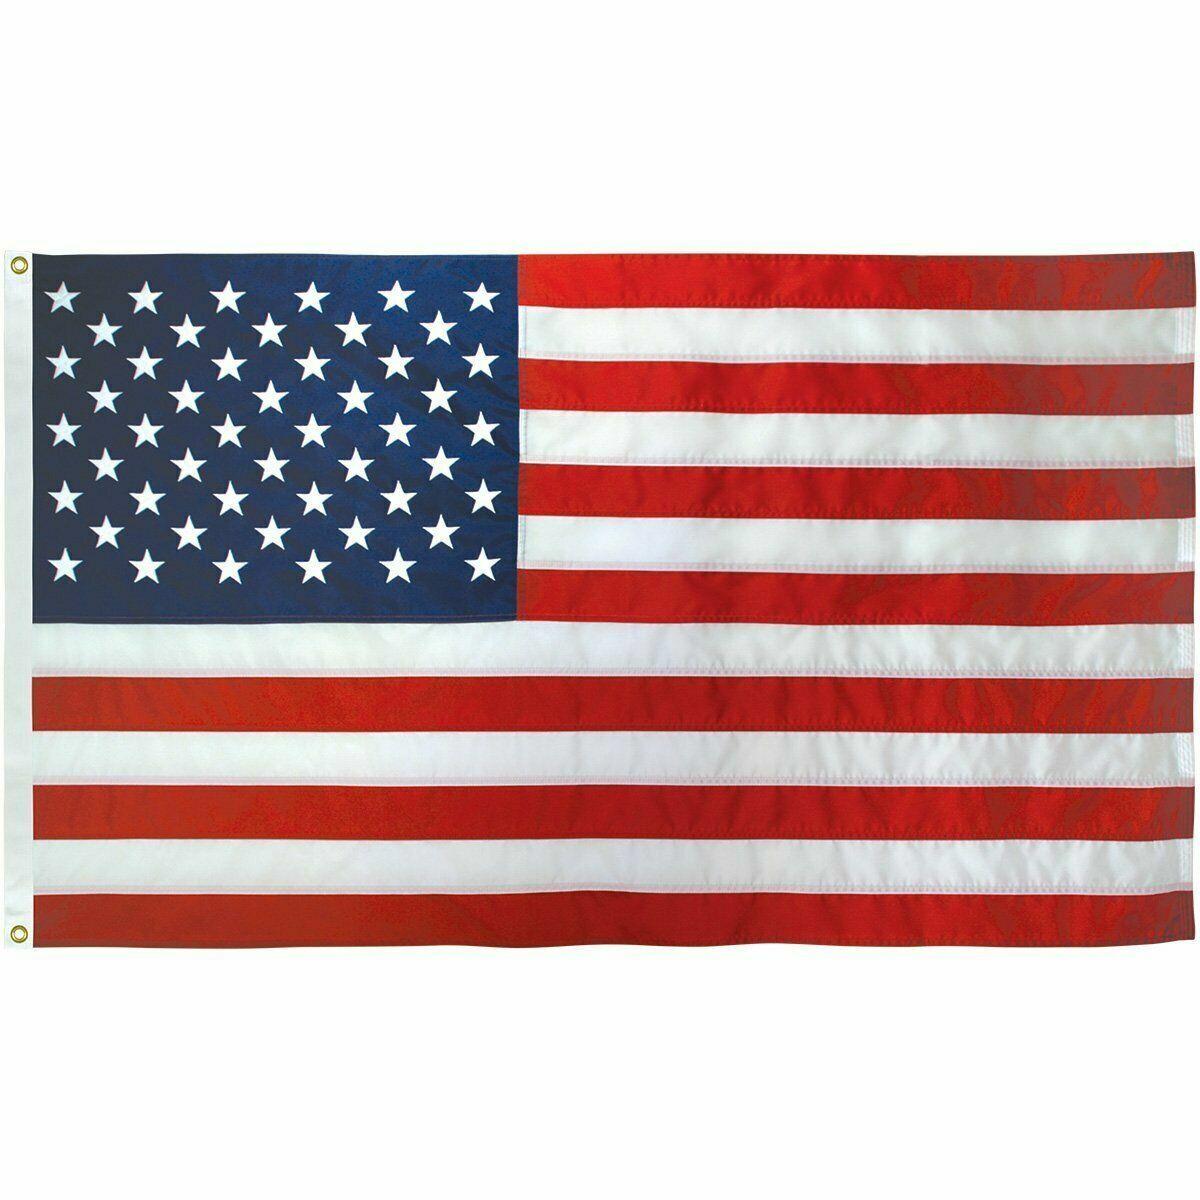 Annin Flagmakers American Flag 3x5 ft. Nylon SolarGuard Nyl-